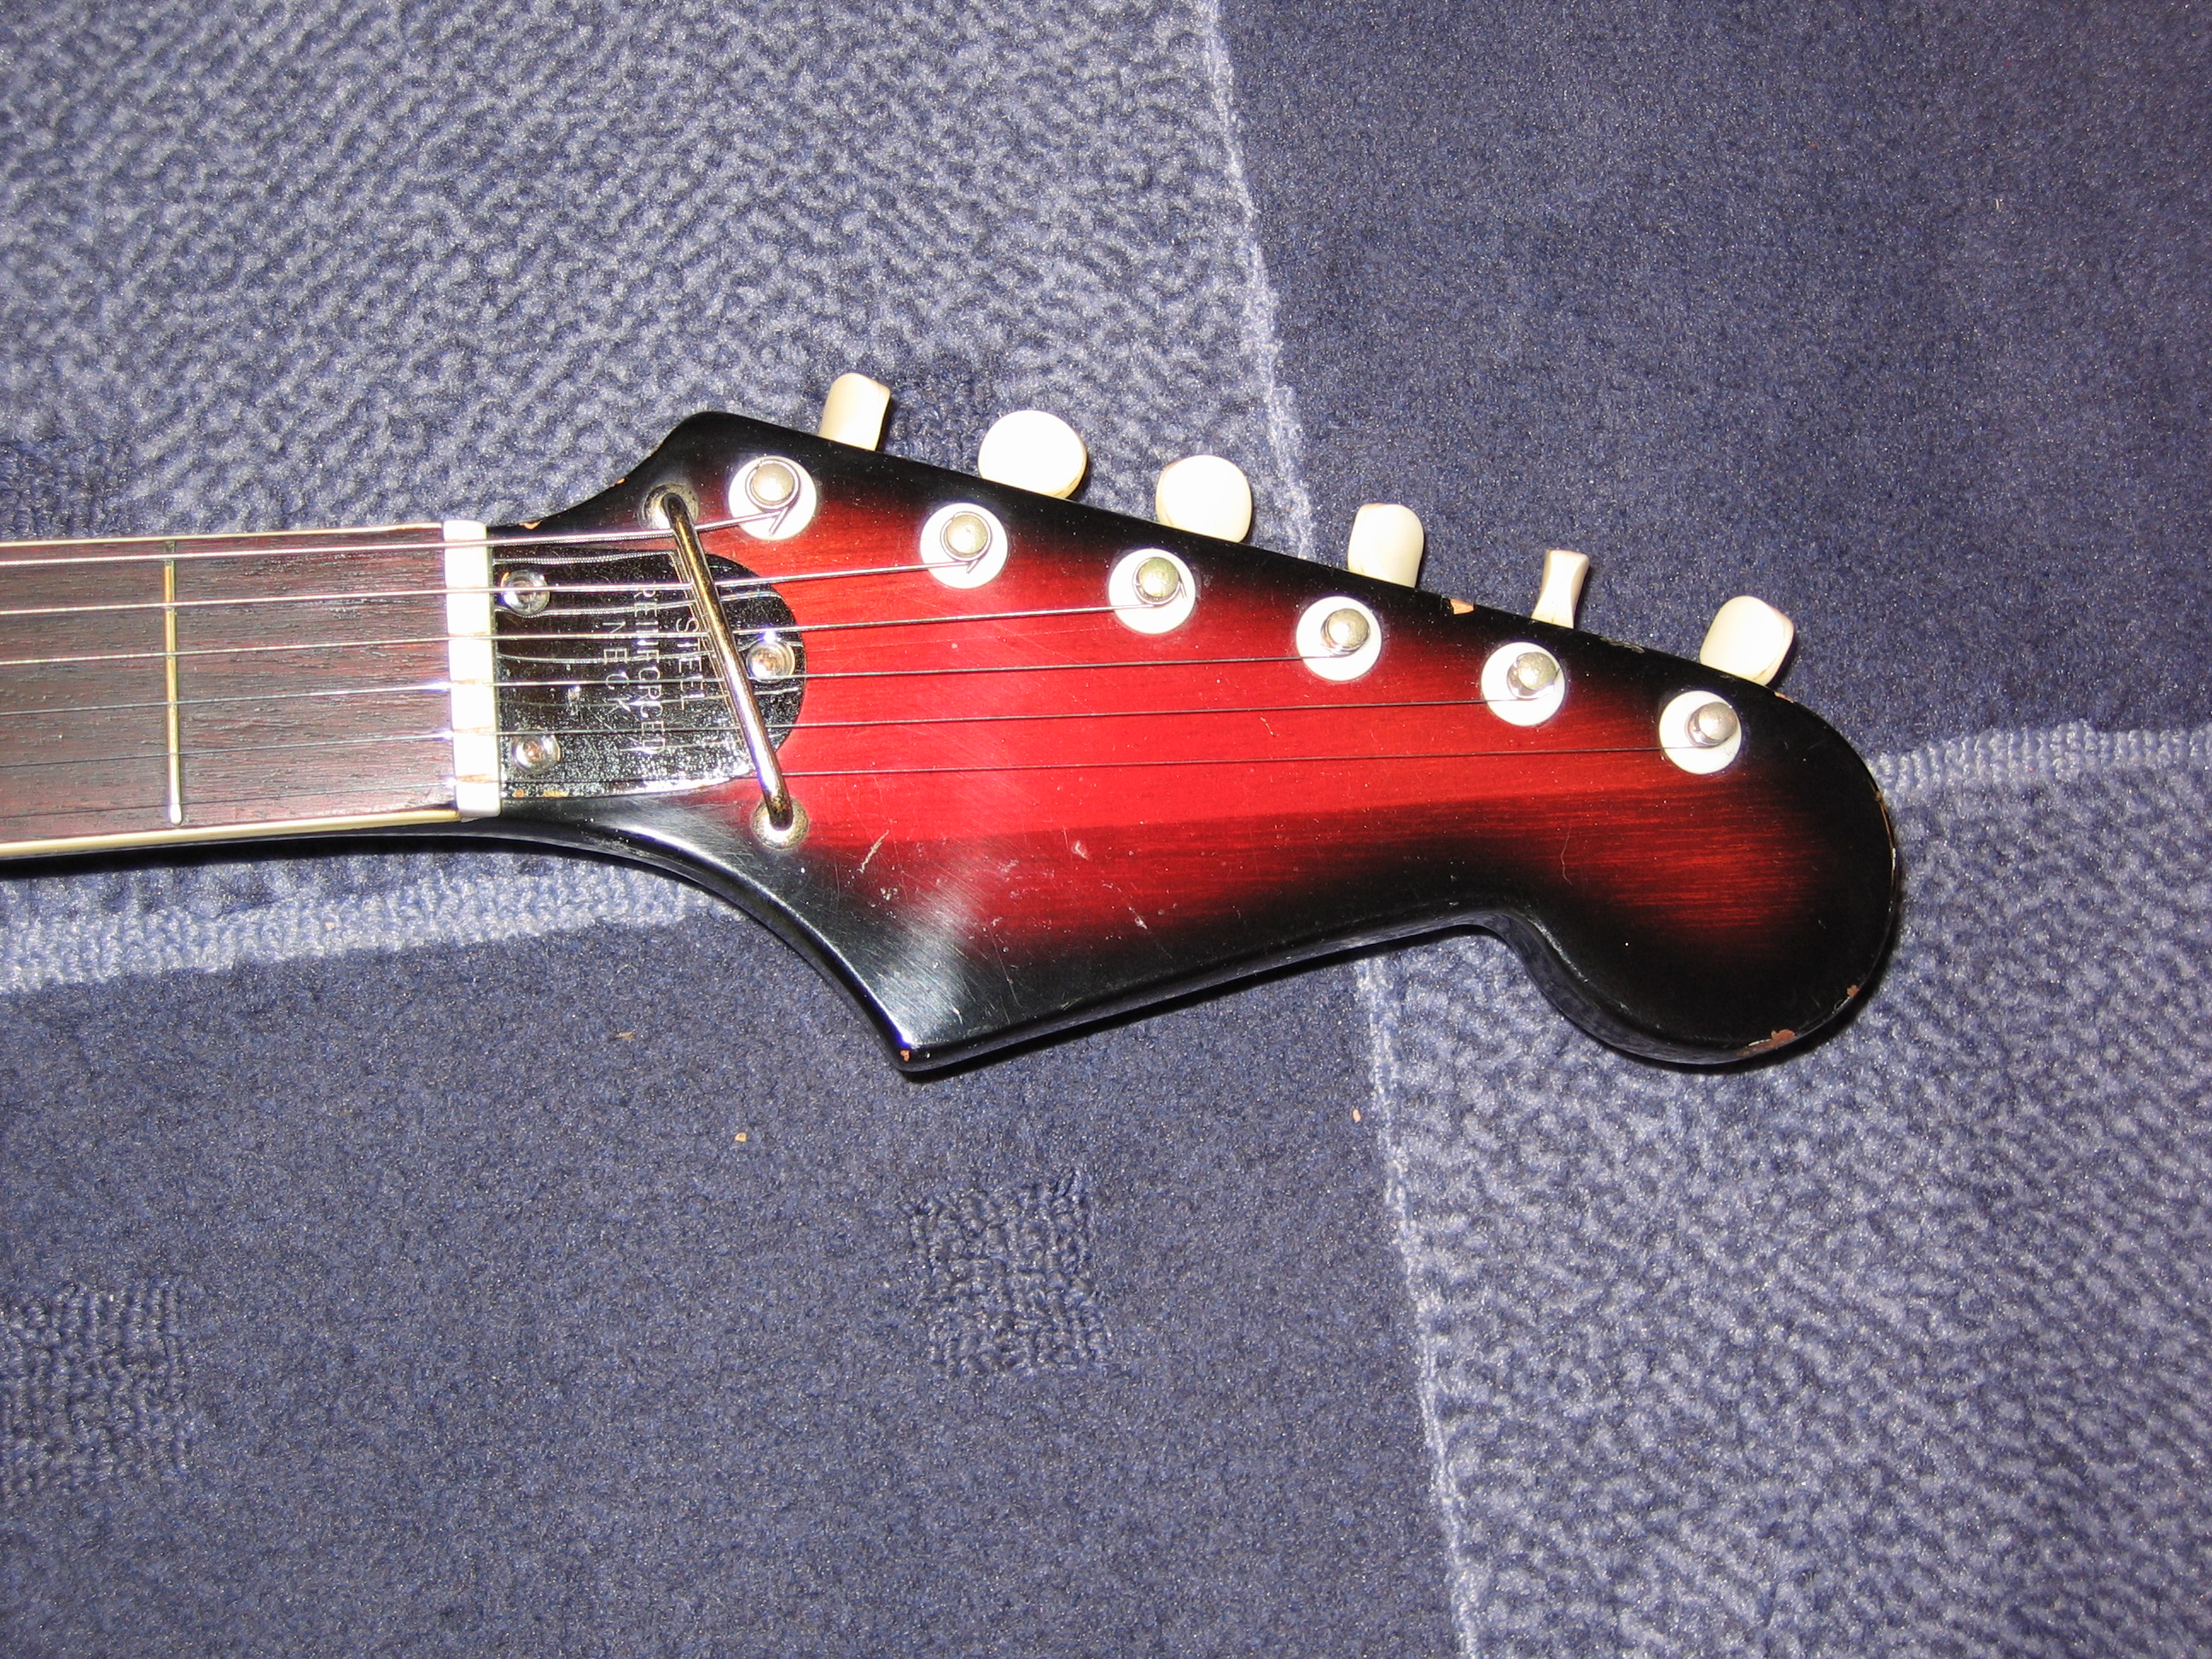 Teisco Guitar Wiring Diagram Imperial Electrical Diagrams 1967 Japanese Sekova Mentor Drowning In Guitars Fender Amp